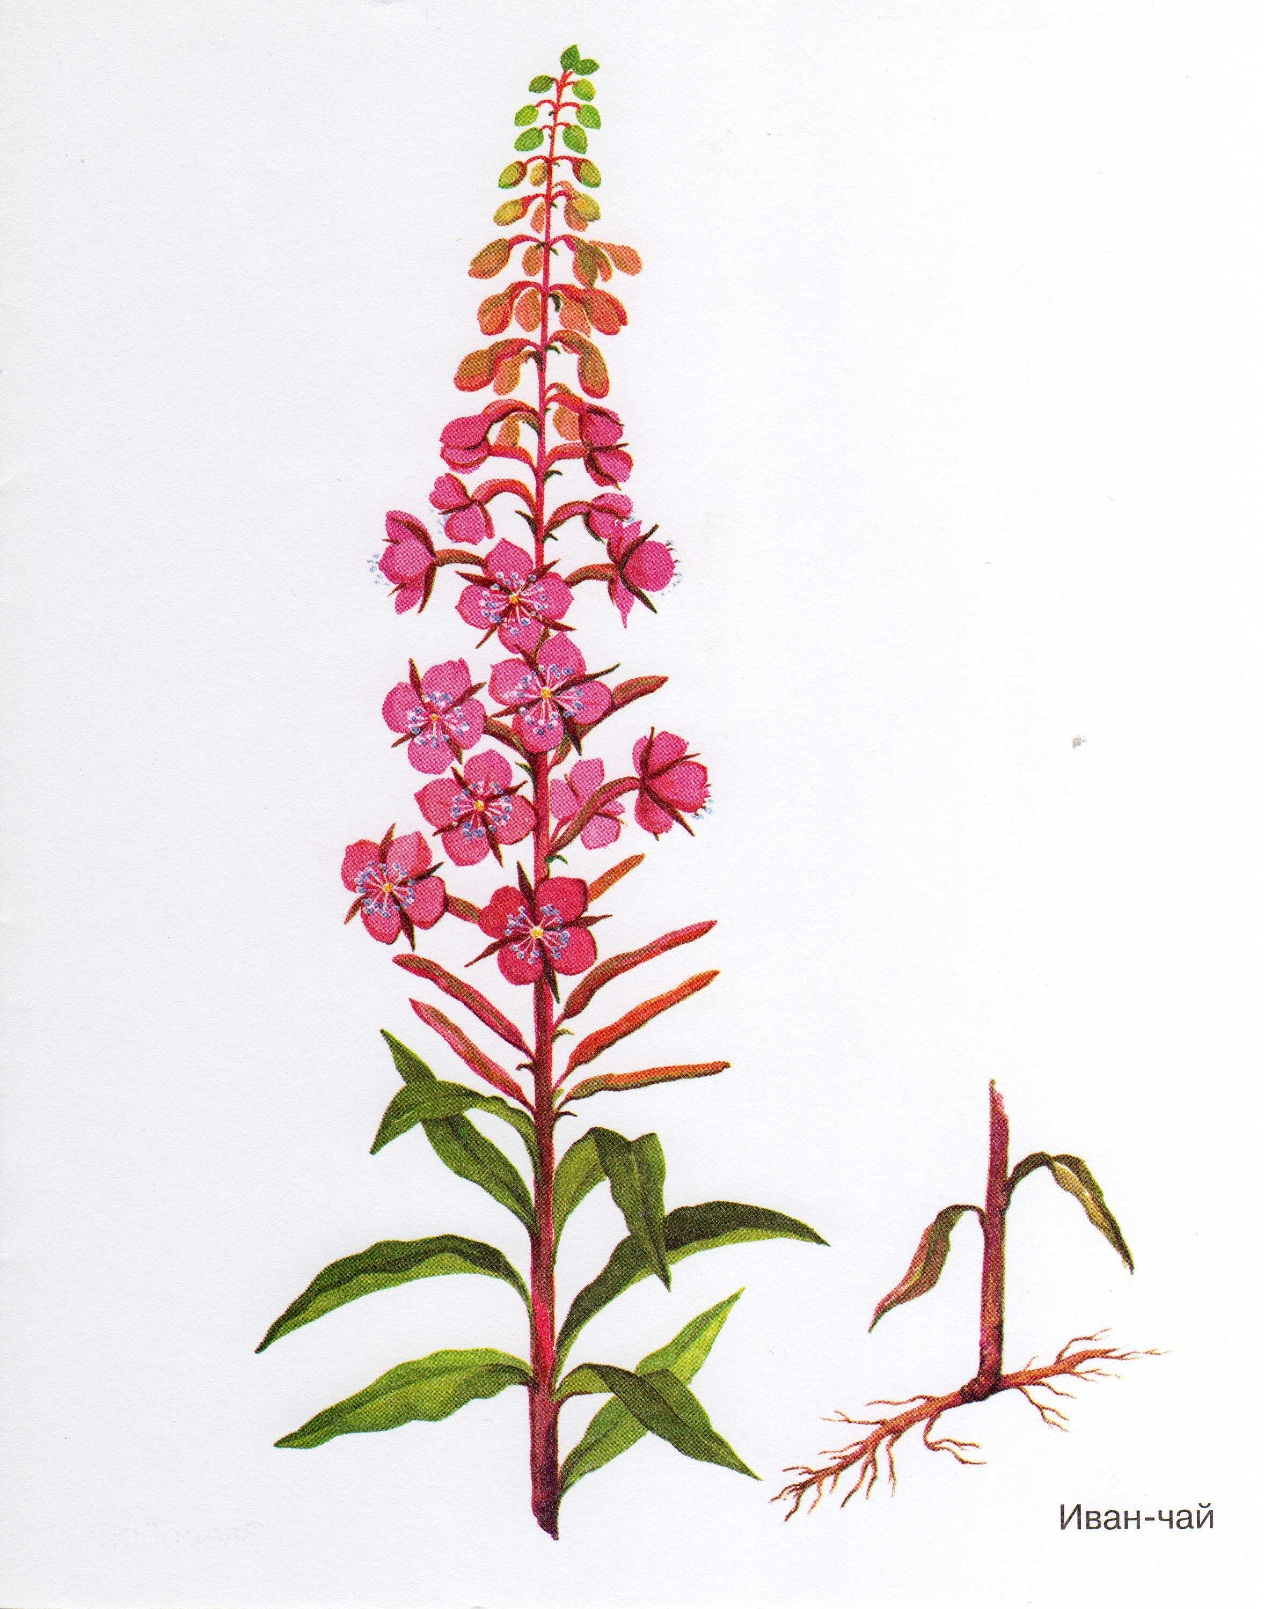 http://dasha46.narod.ru/Encyclopedic_Knowledge/Biology/Plants/Herbs/Willow-herb.jpg